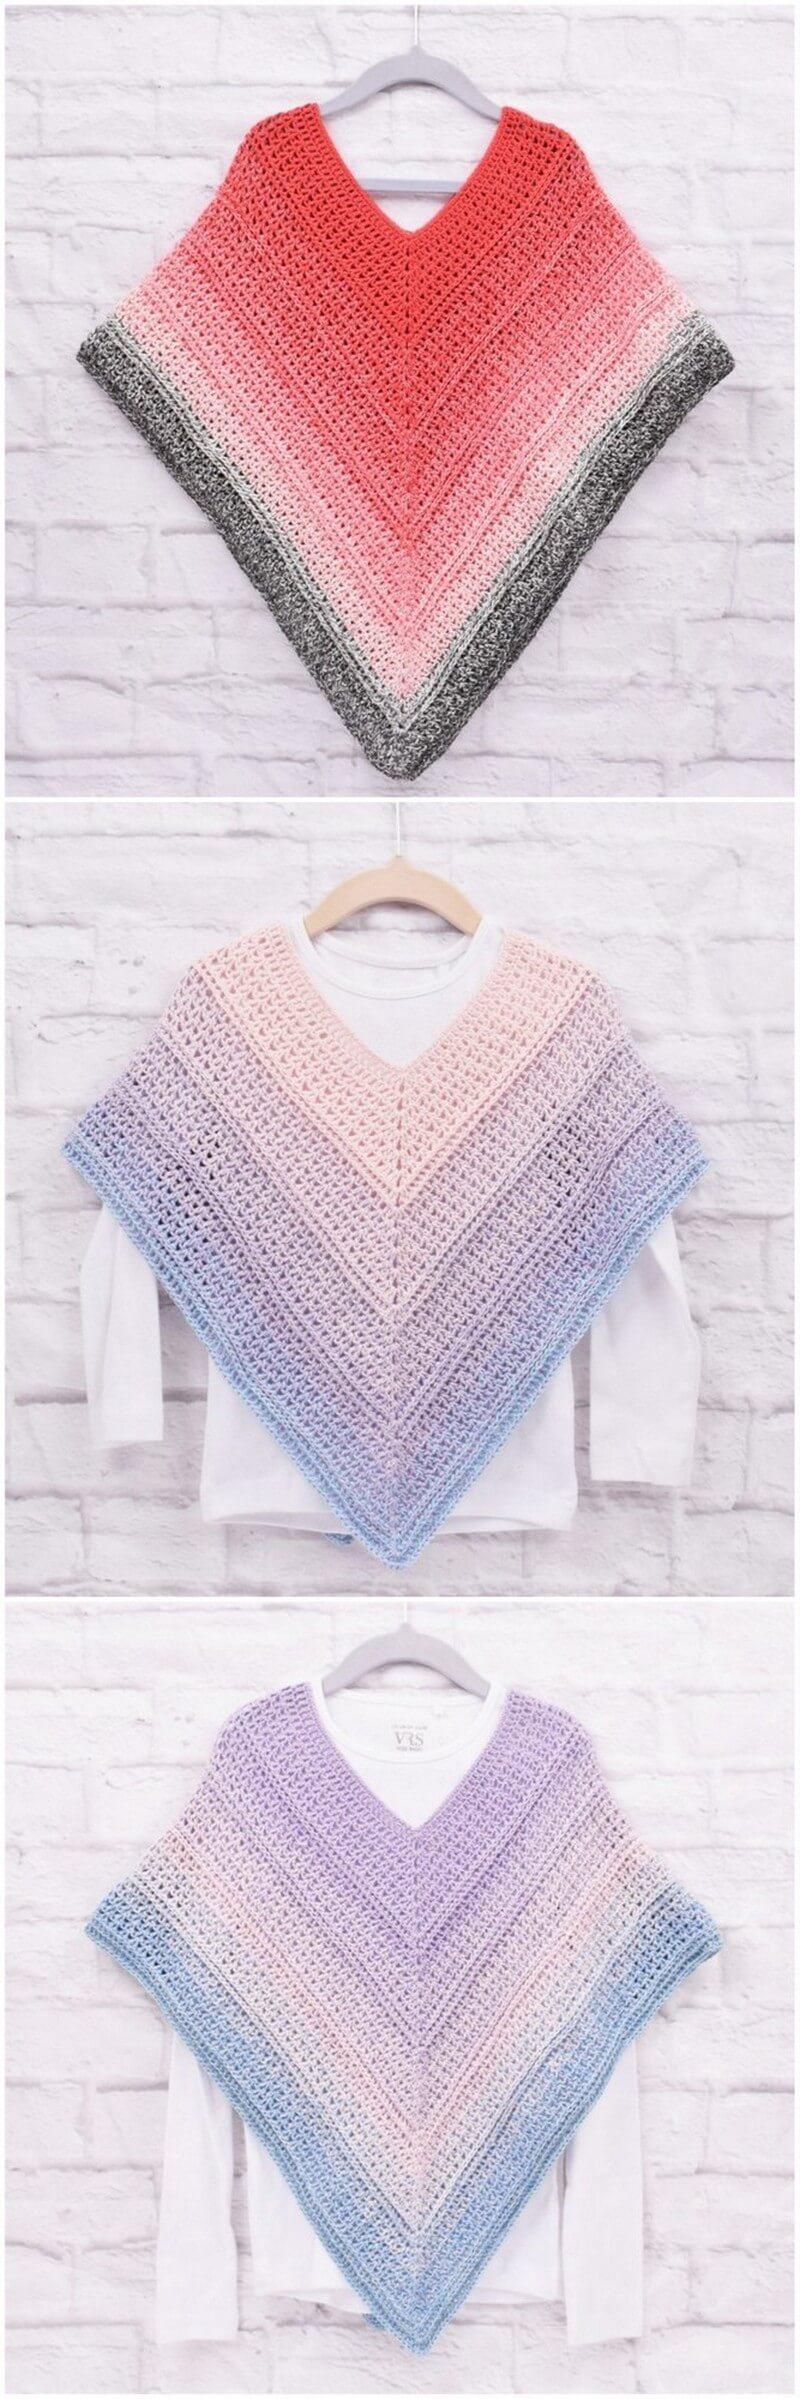 Crochet Poncho Pattern (44)